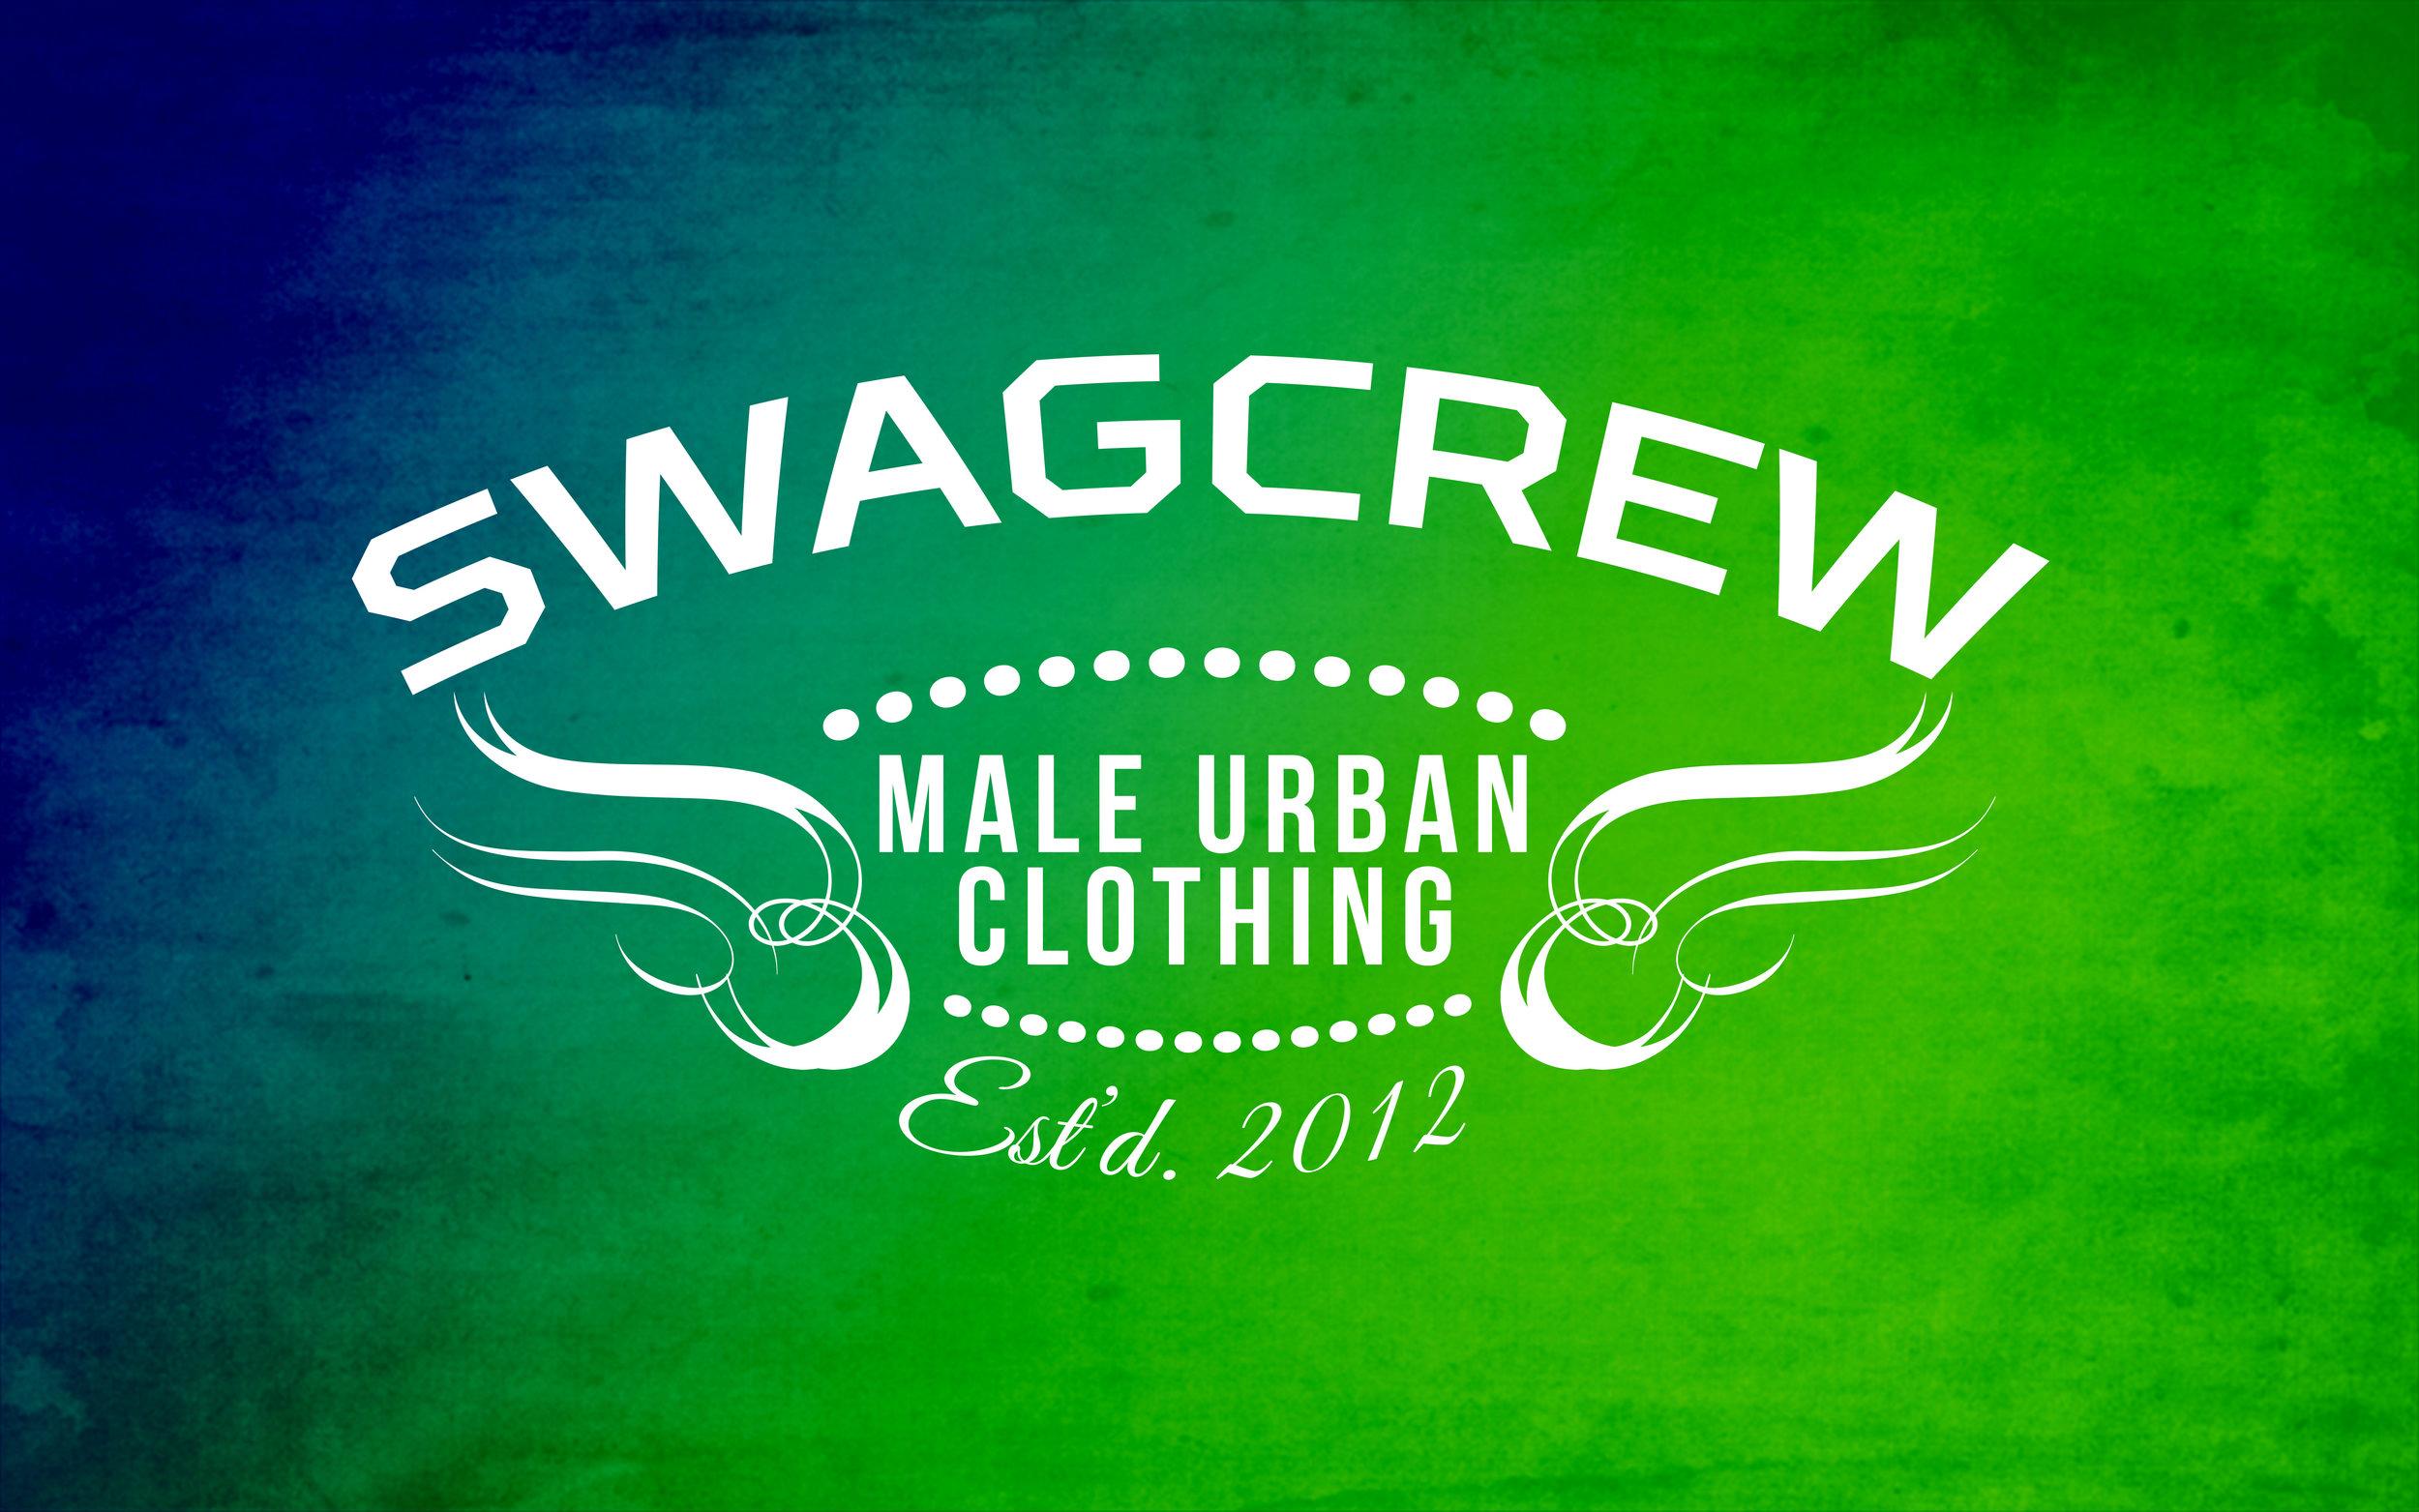 SWAGCREW-wht_tx_grunge_bgnd.jpg